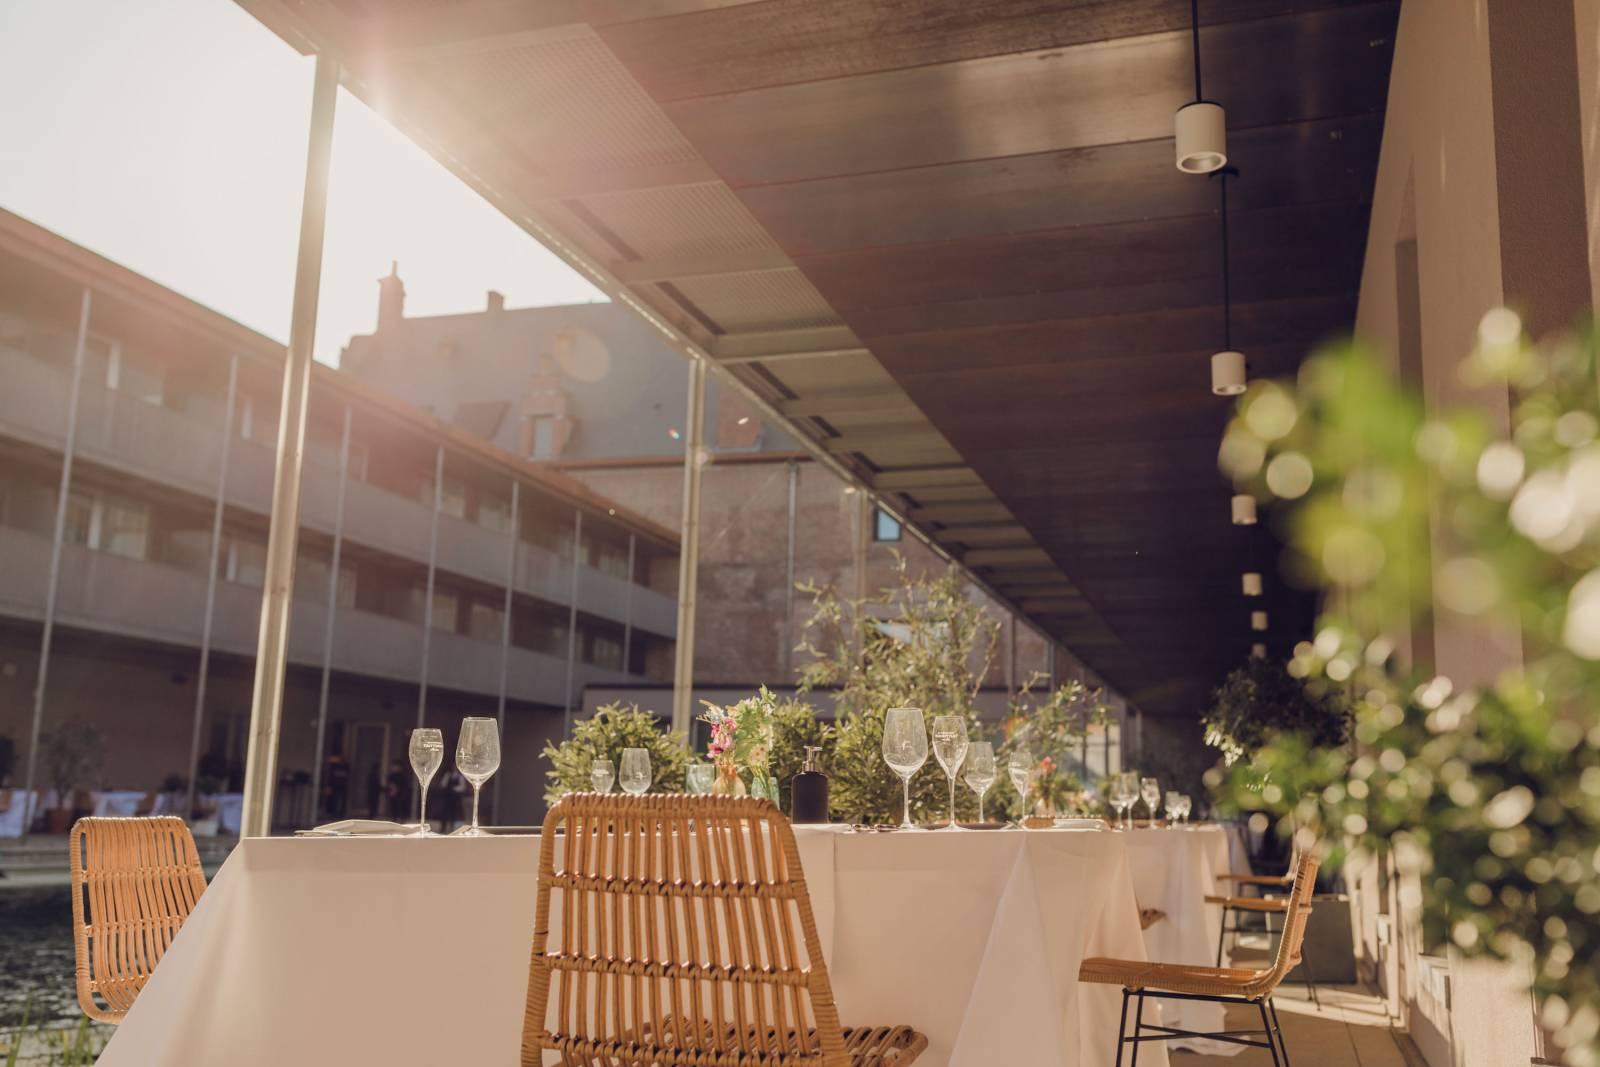 Van der Valk Hotel Mechelen - House of Weddings - 2